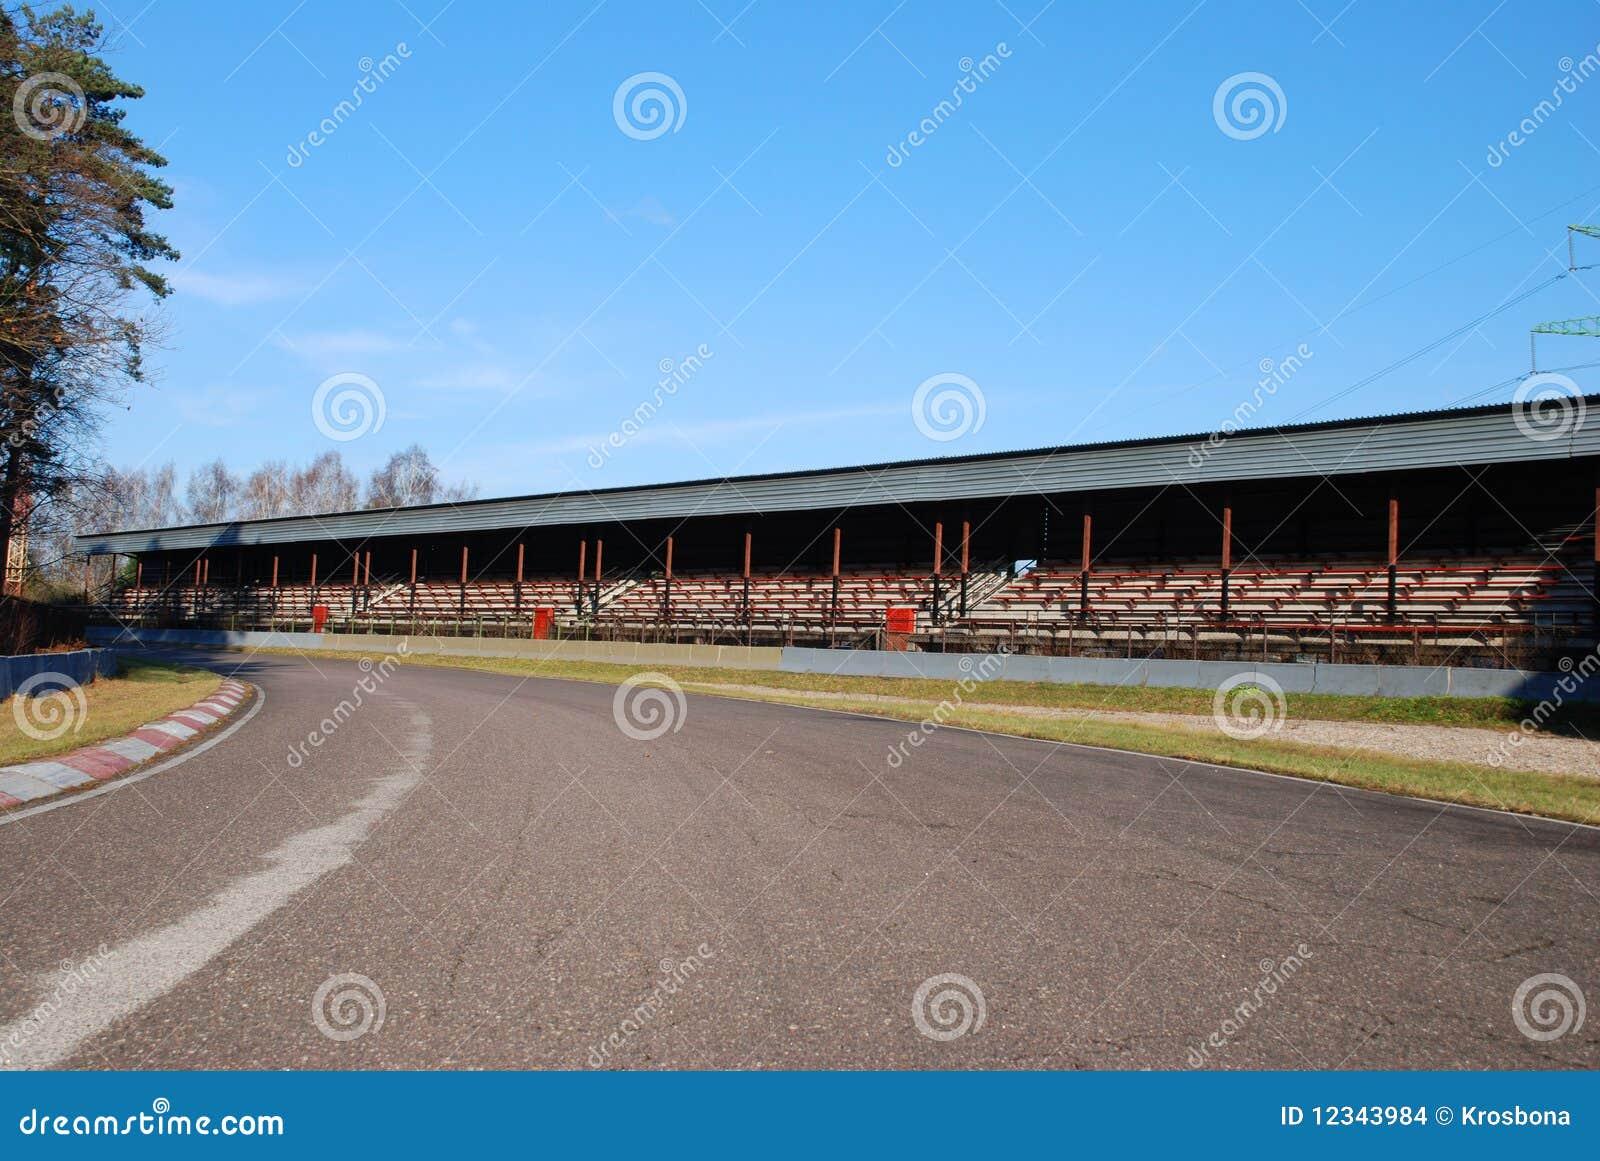 Old motor racing track